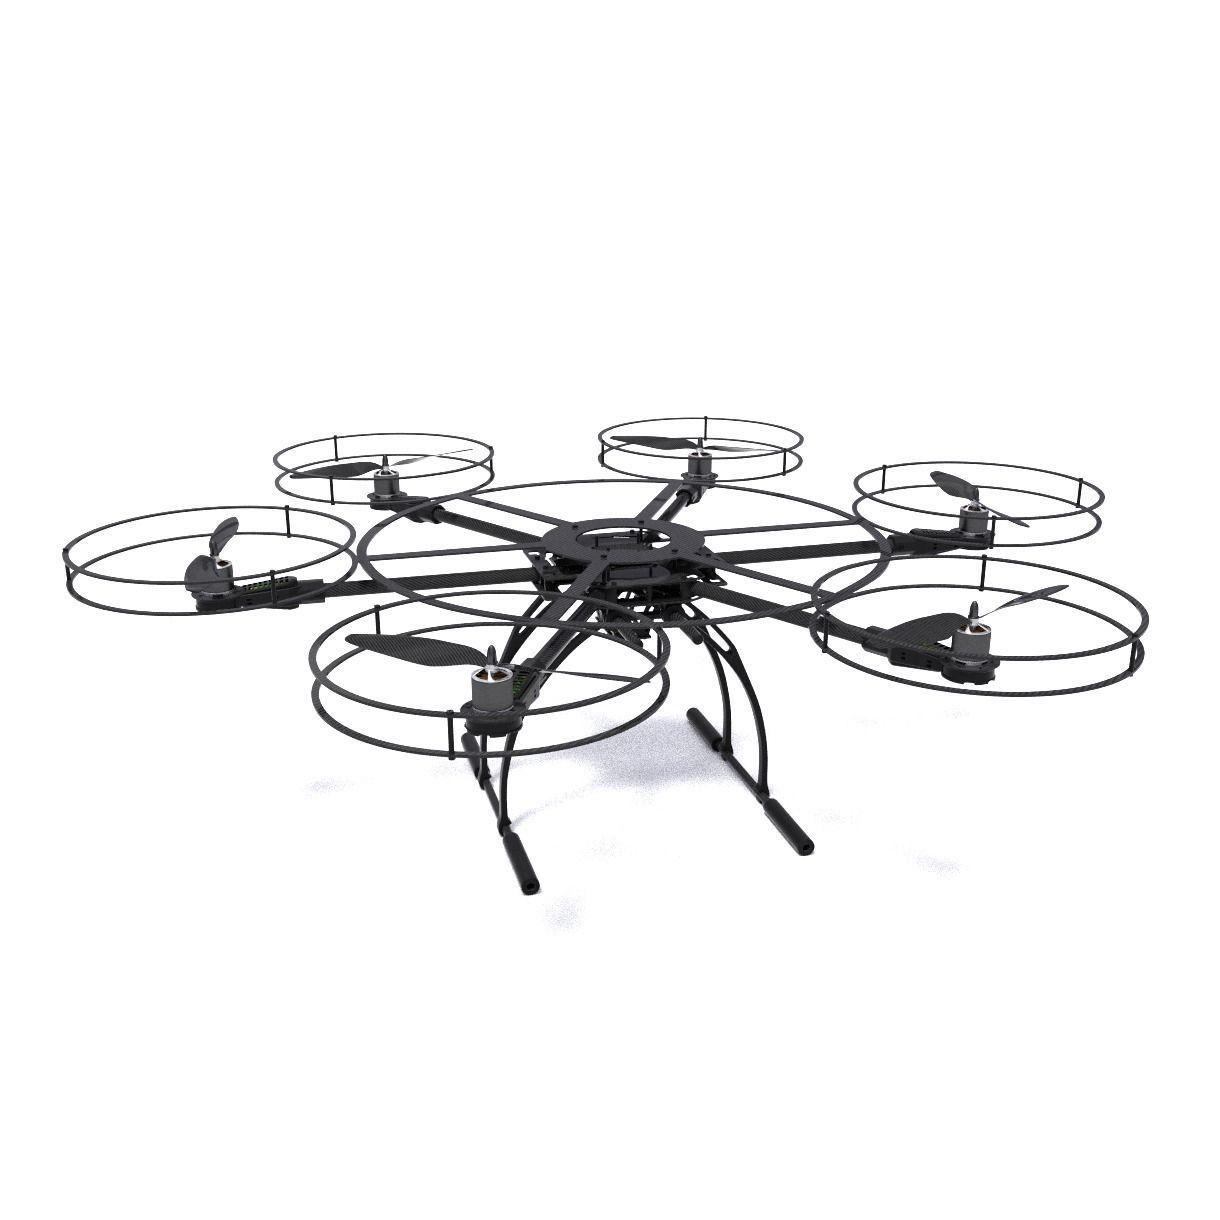 Hexacopter Drone 3d Model Obj Fbx Dxf Stl Blend